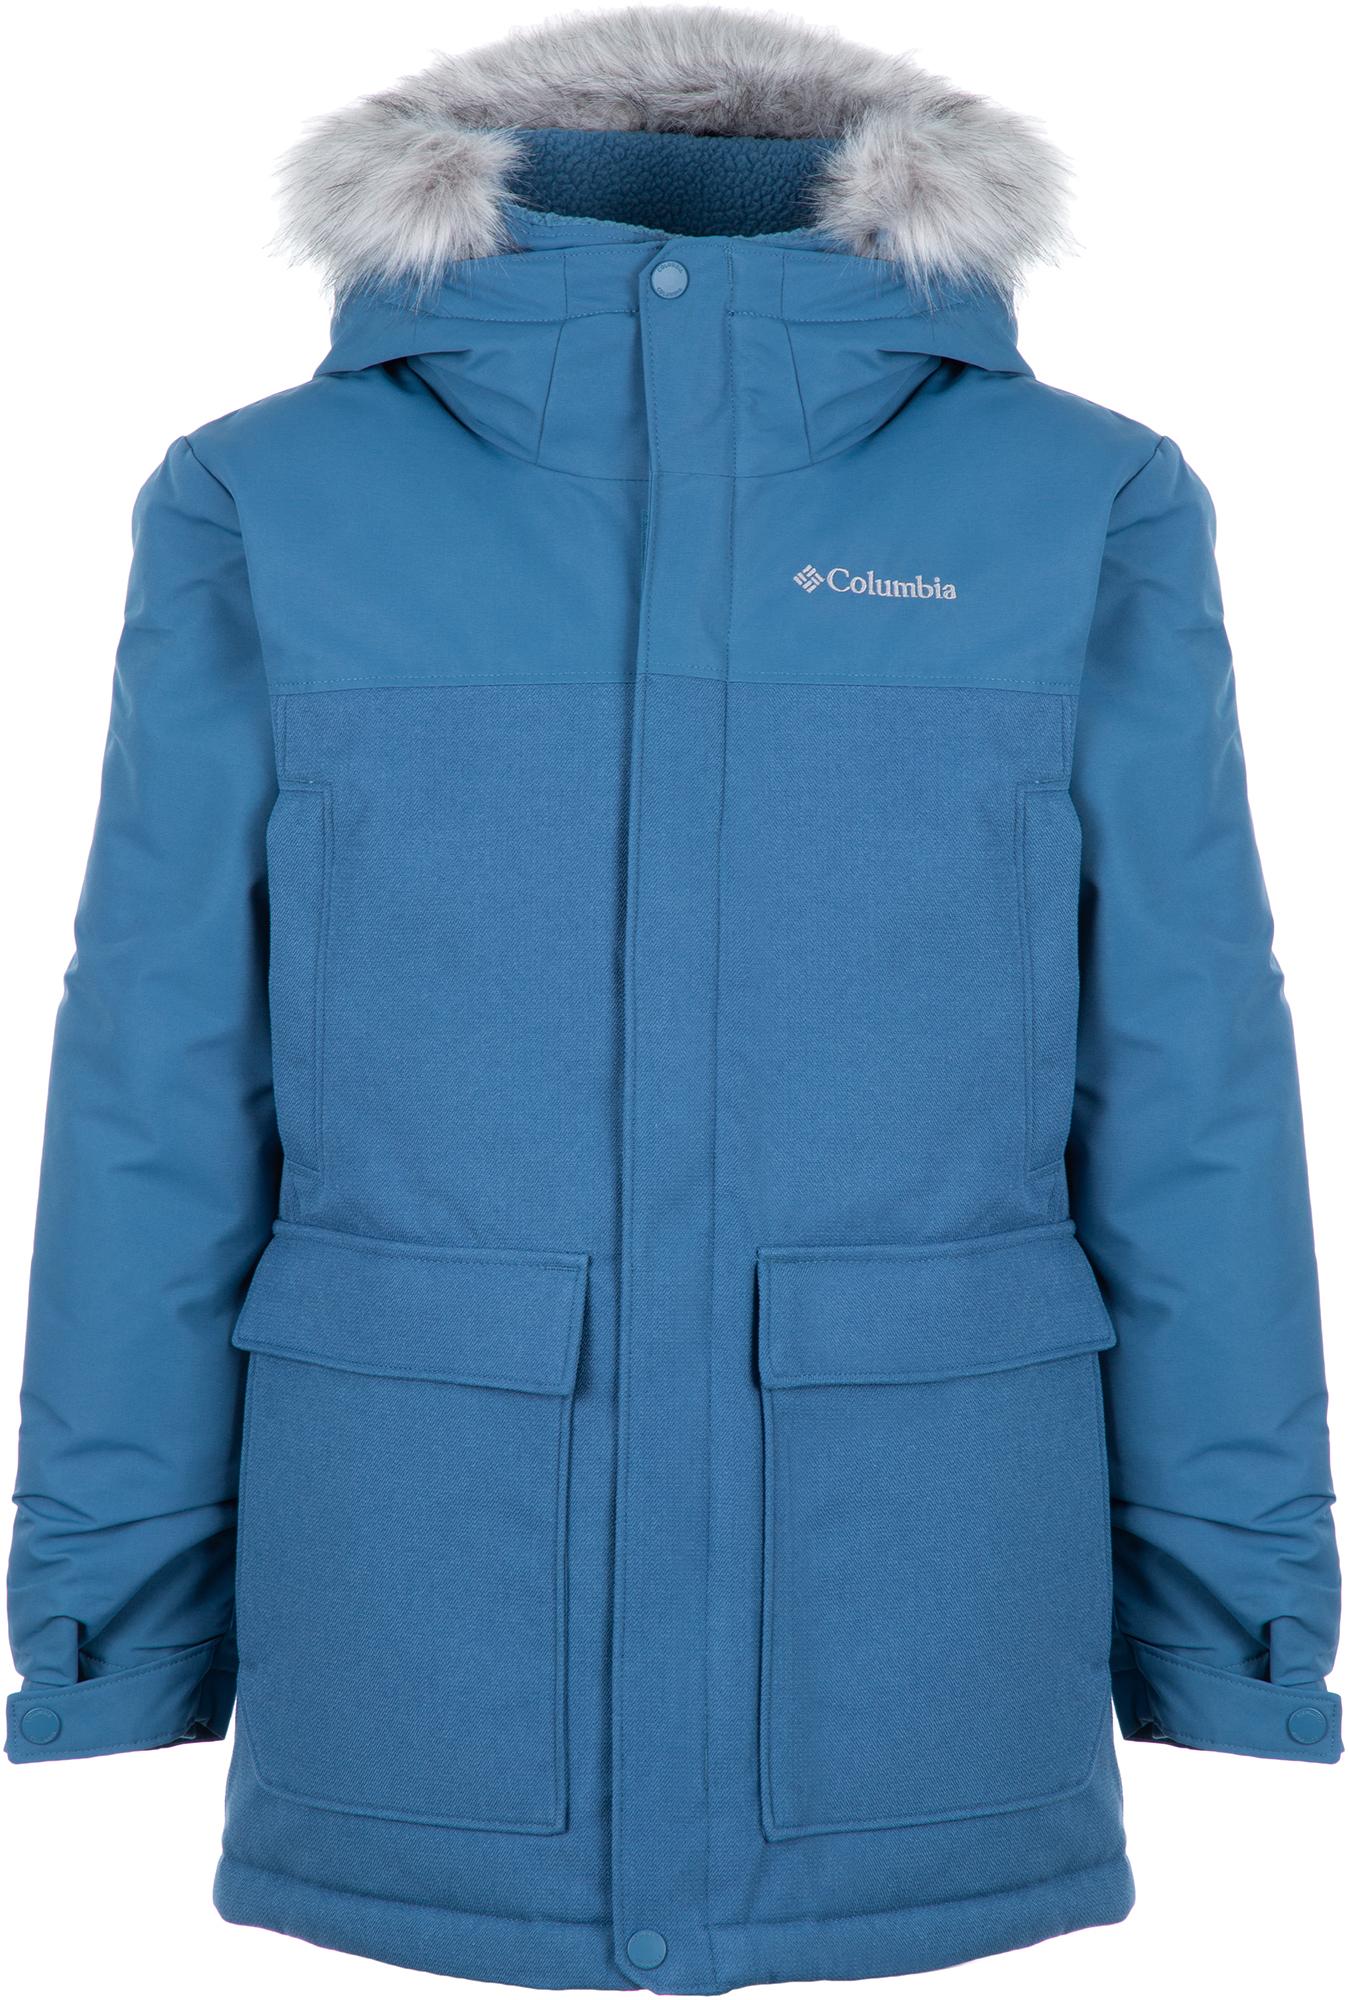 цена на Columbia Куртка пуховая для мальчиков Columbia Boundary Bay, размер 155-159